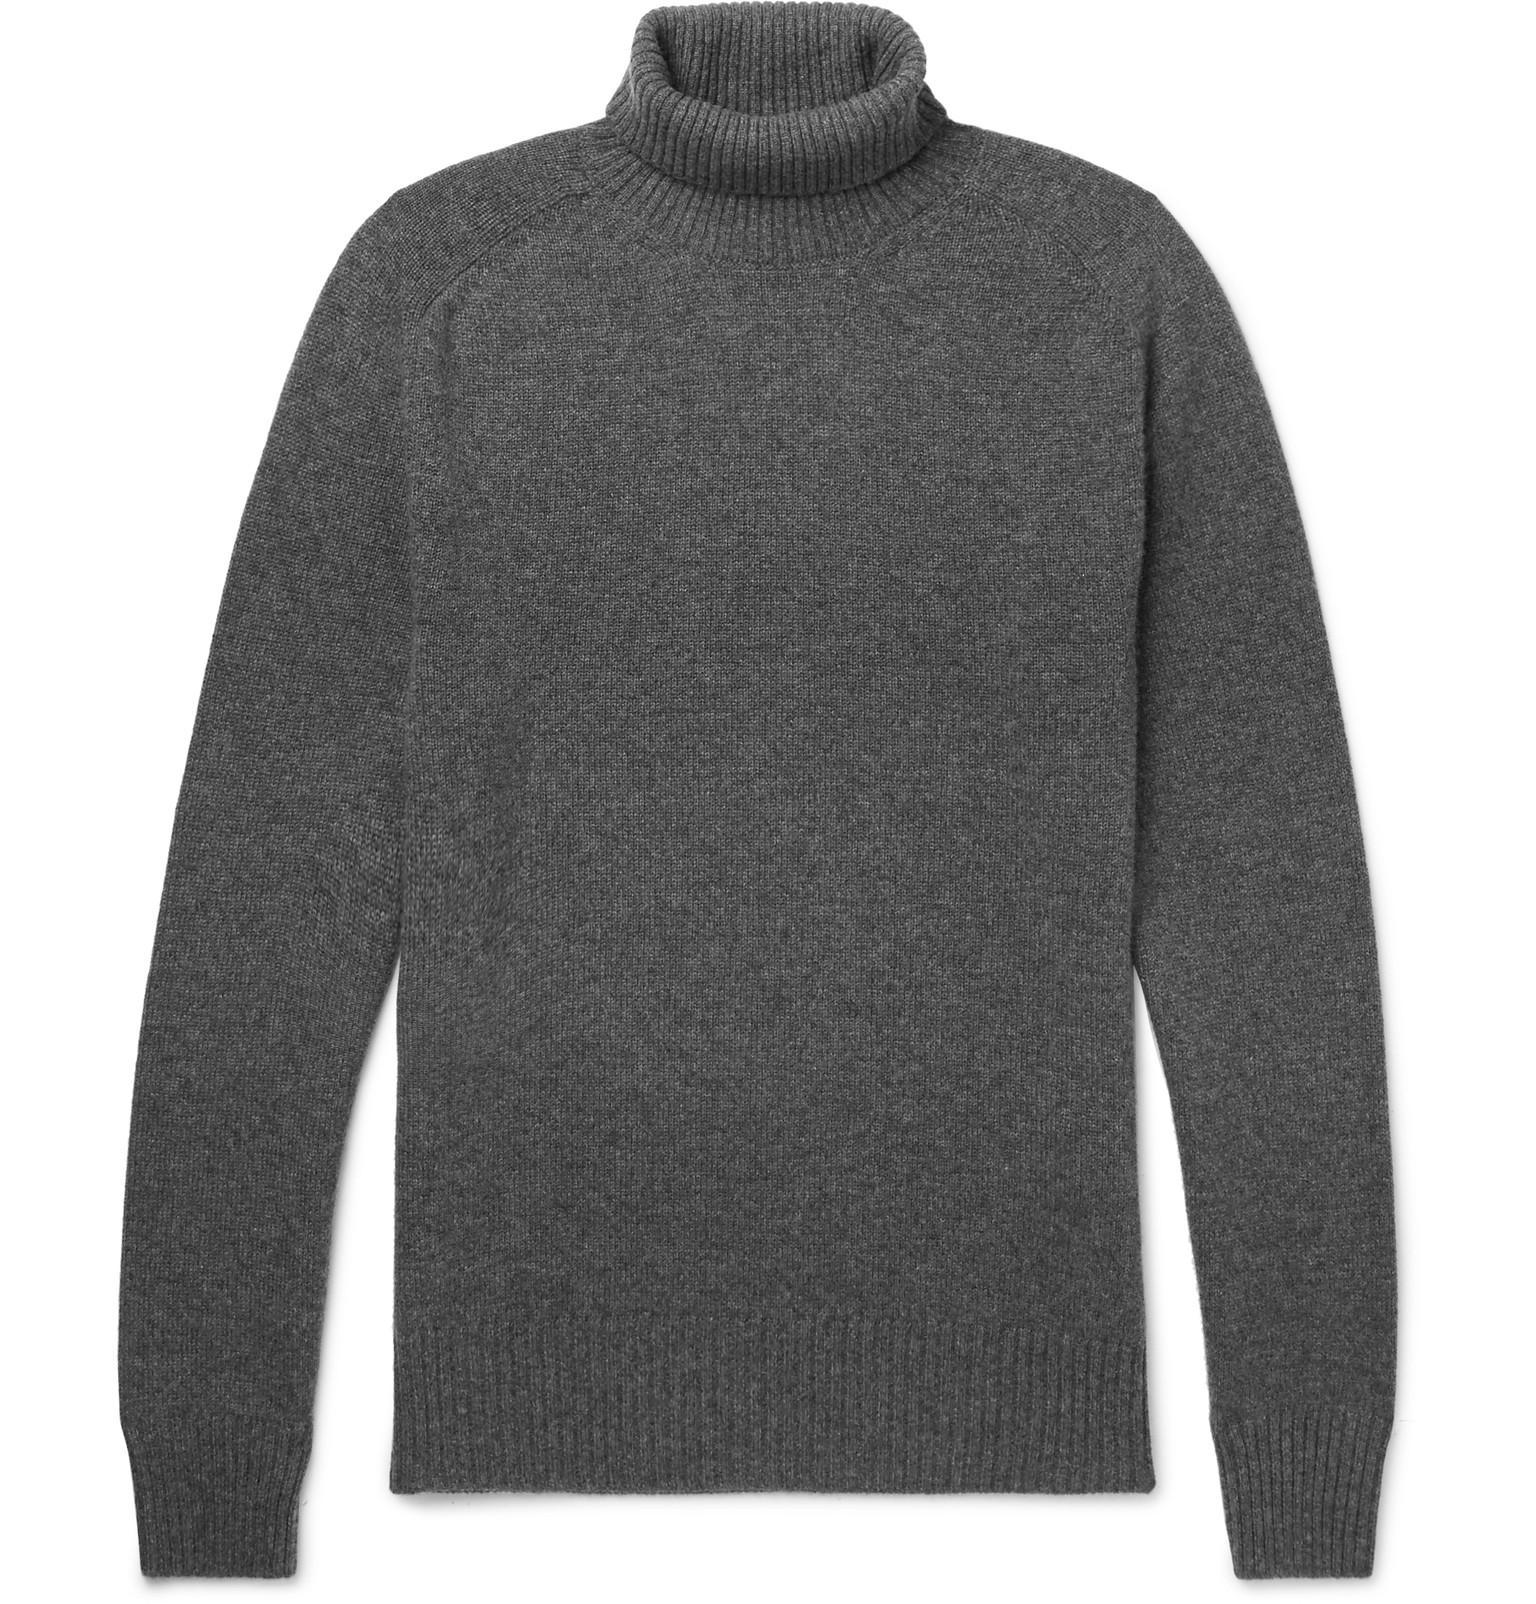 Footlocker Pictures Cheap Online Cheap Classic Mélange Cashmere Rollneck Sweater Tomas Maier vCSPv7W